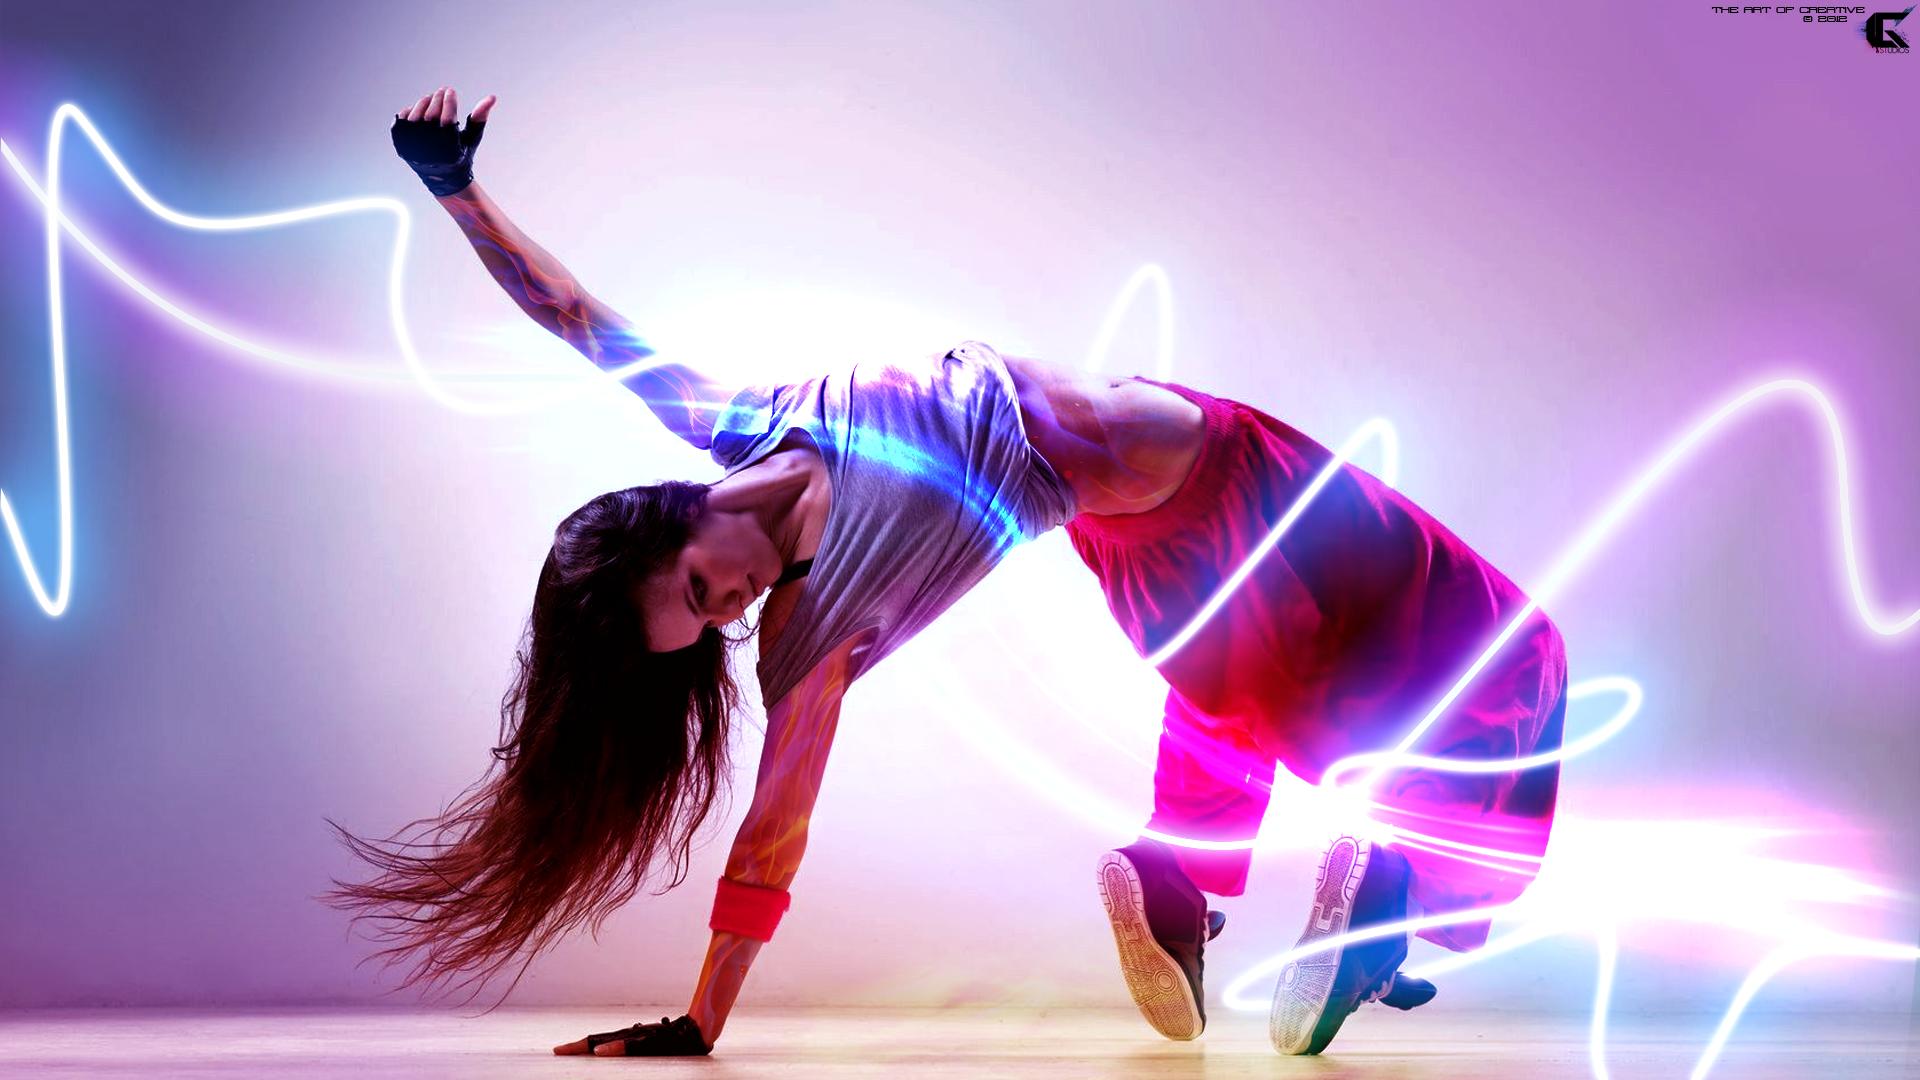 Dancing Girl Wallpaper   Full HD by iGStudios 1920x1080